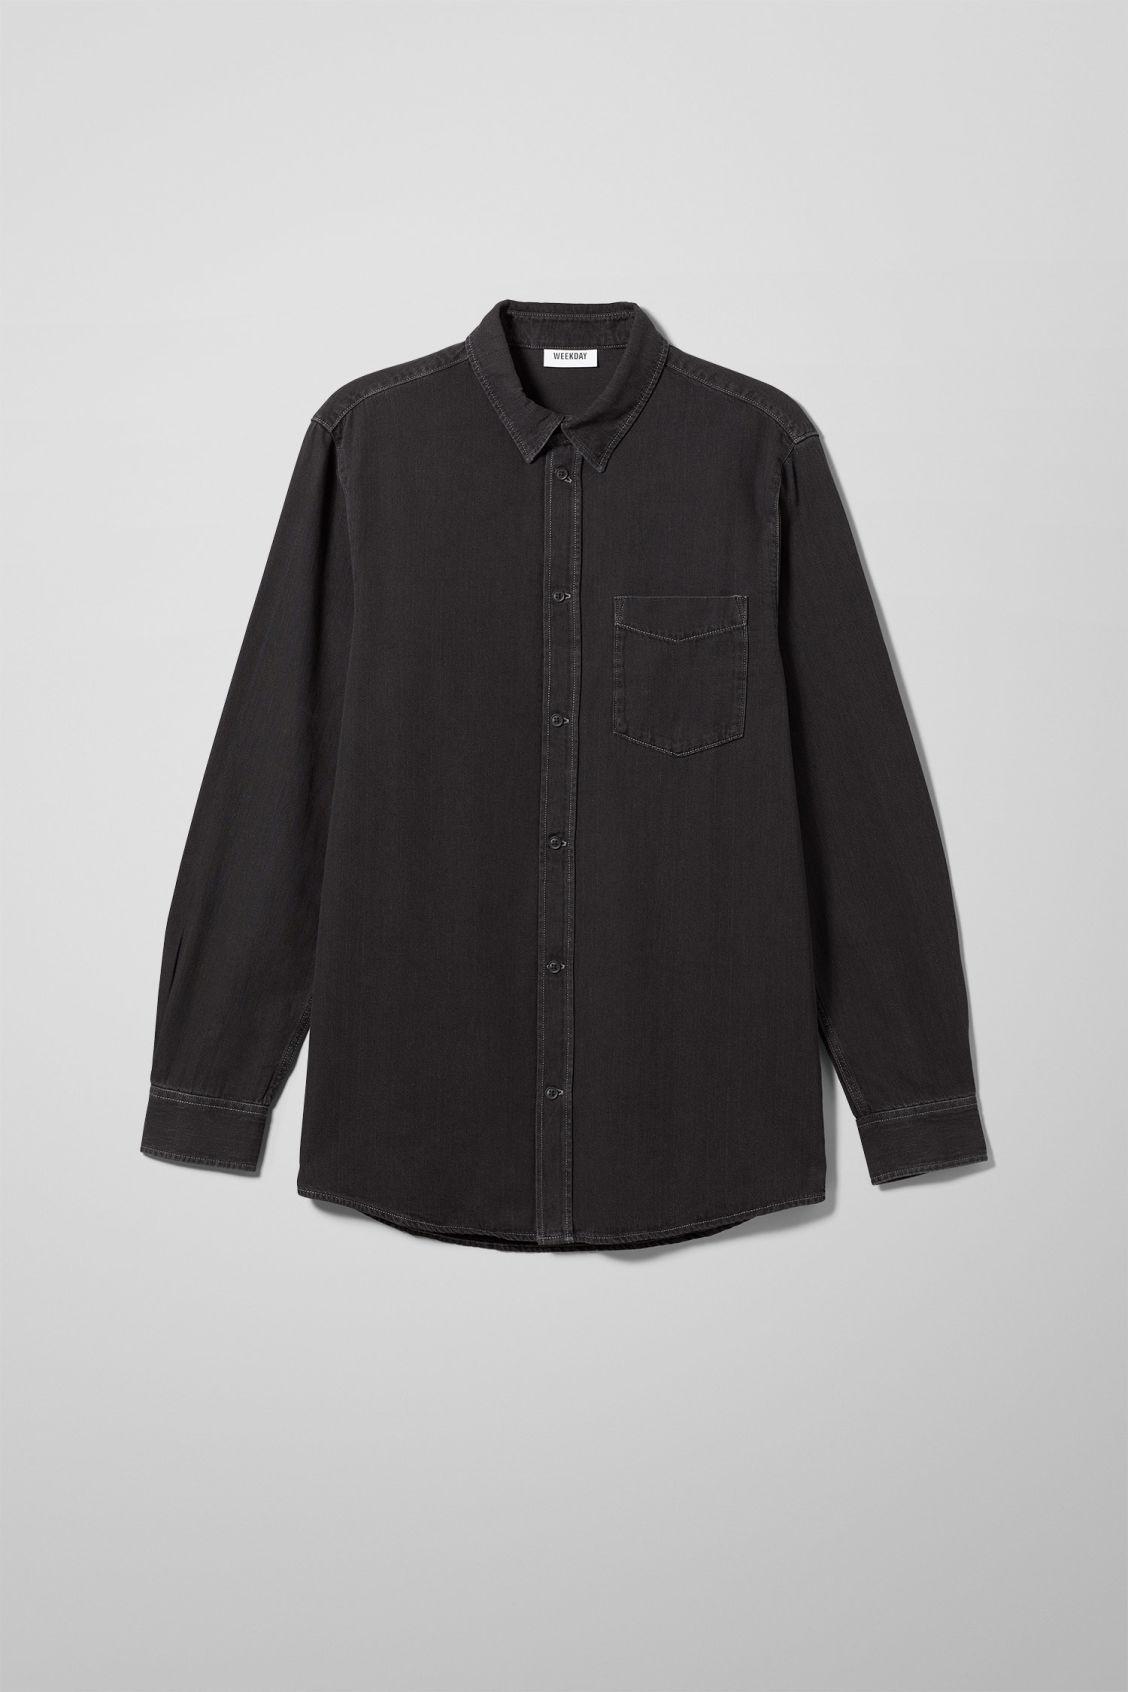 Neo Denim Shirt Washed Black - Black